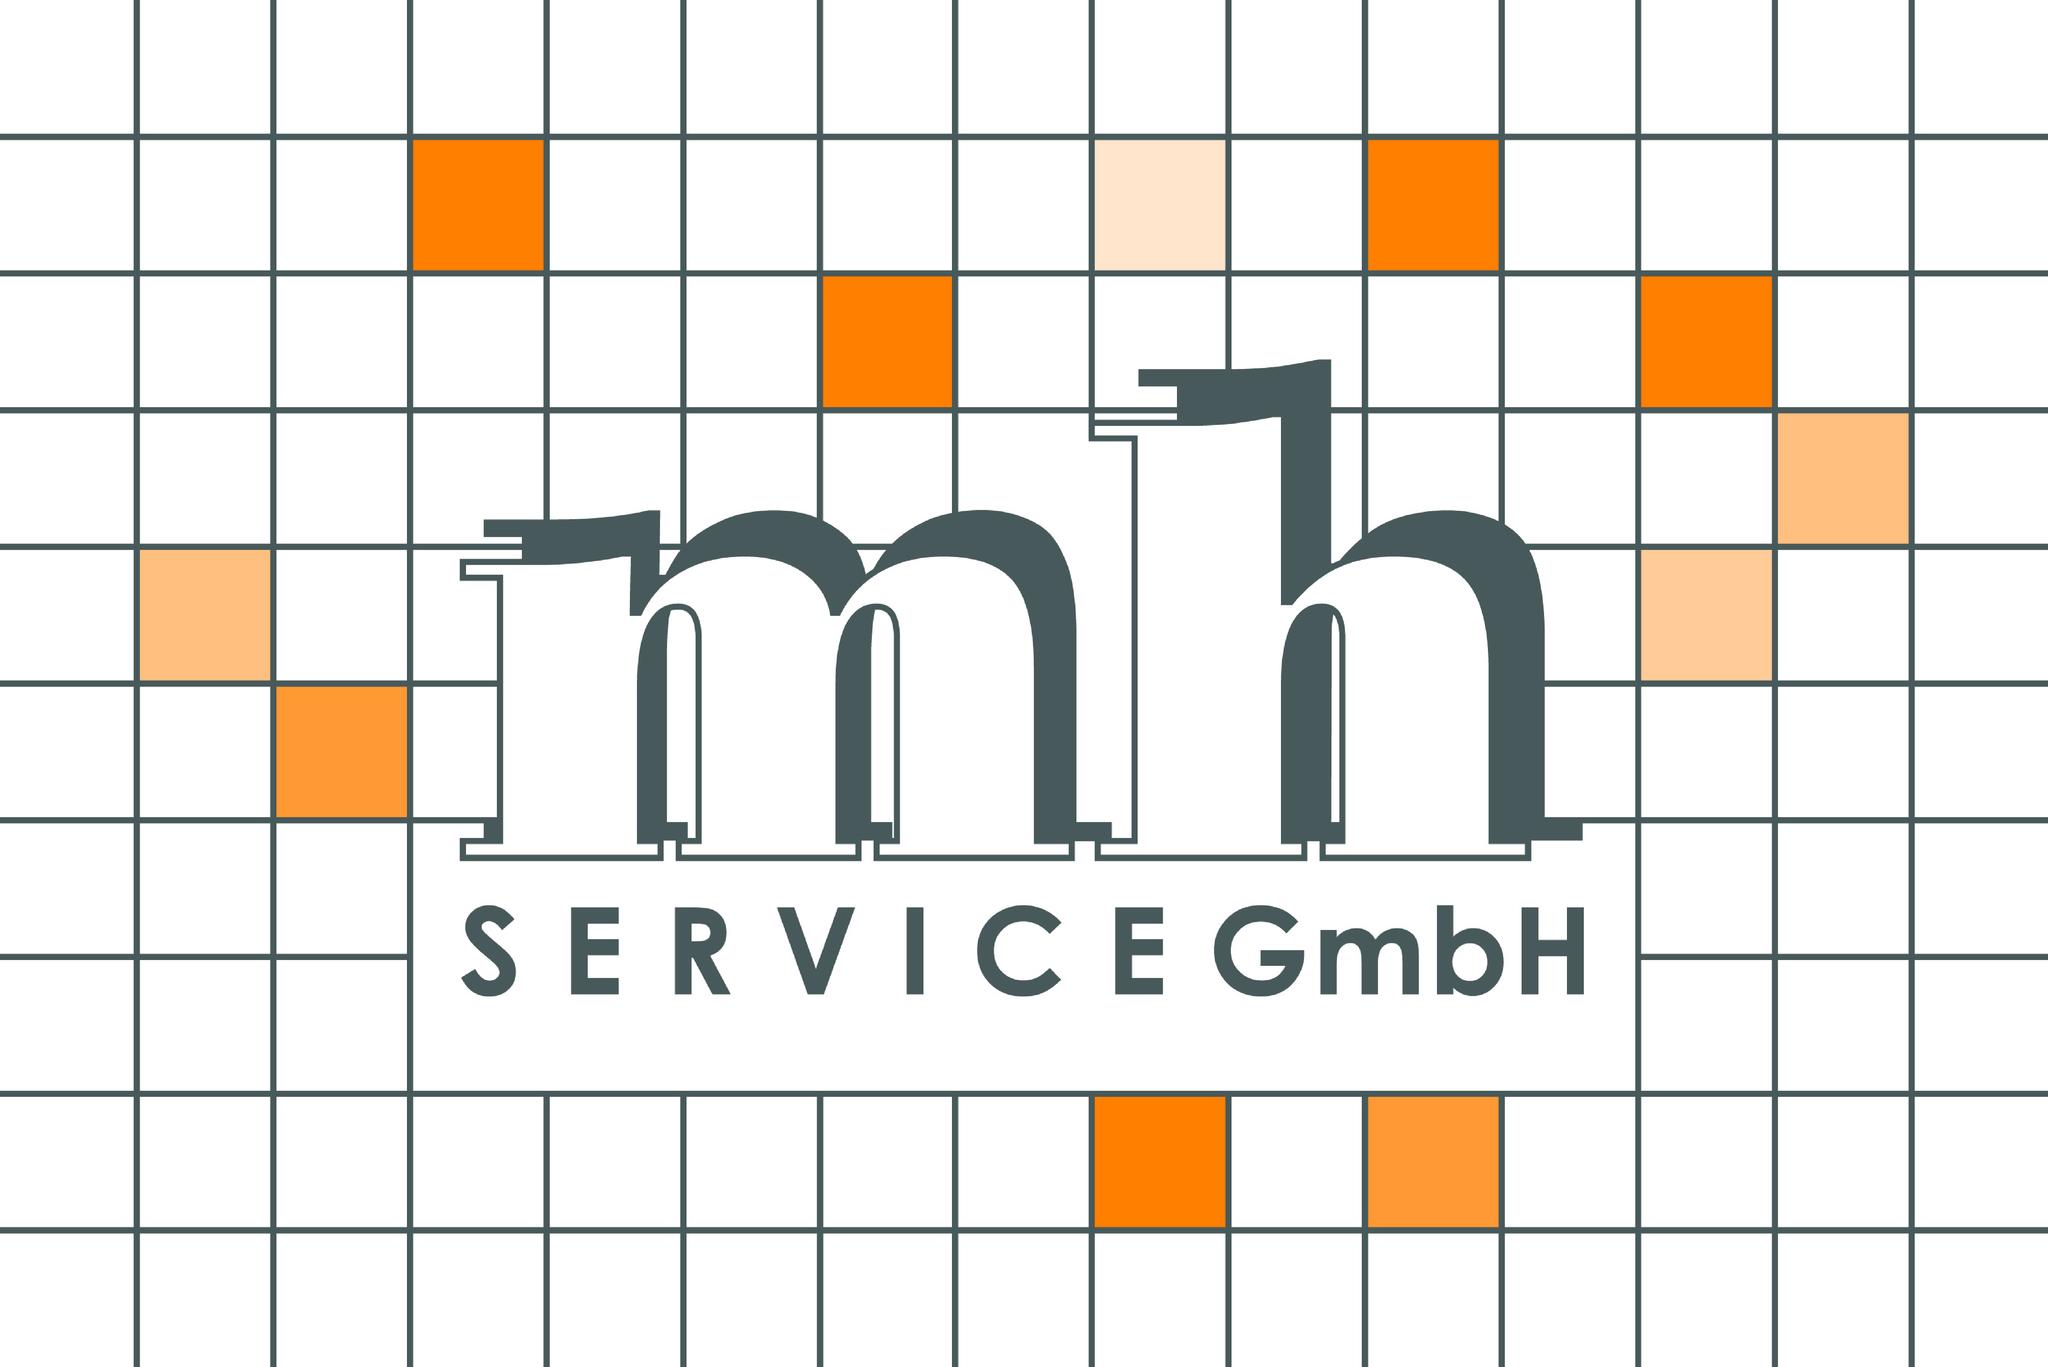 MH Service GMBH (Germany)